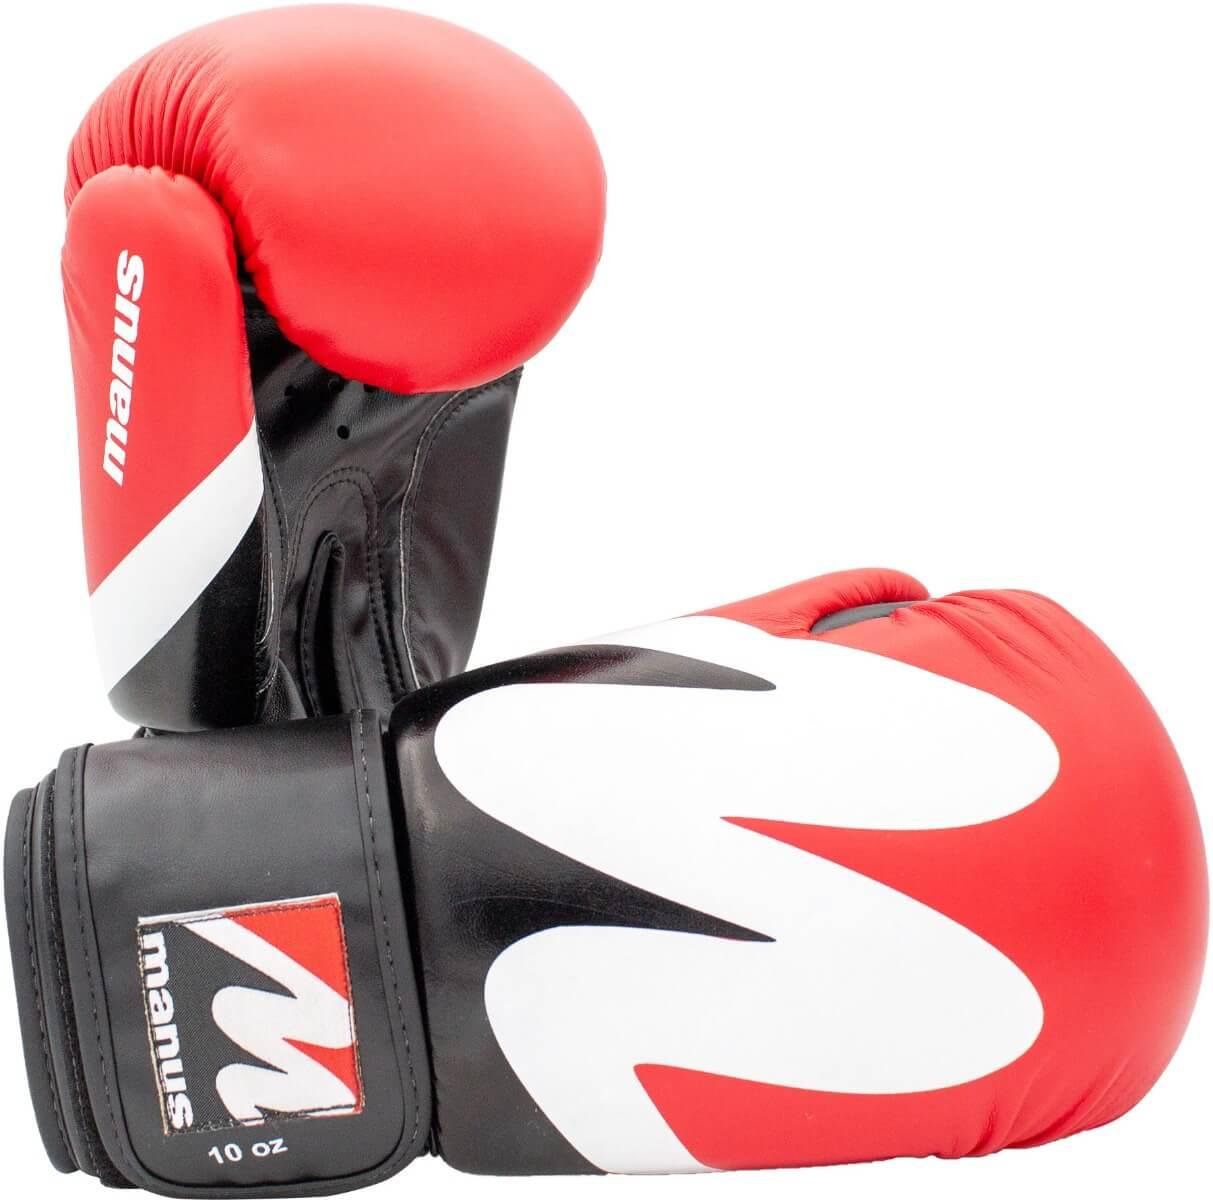 Boxhandschuh Manus 2019 Schwarz-Rot